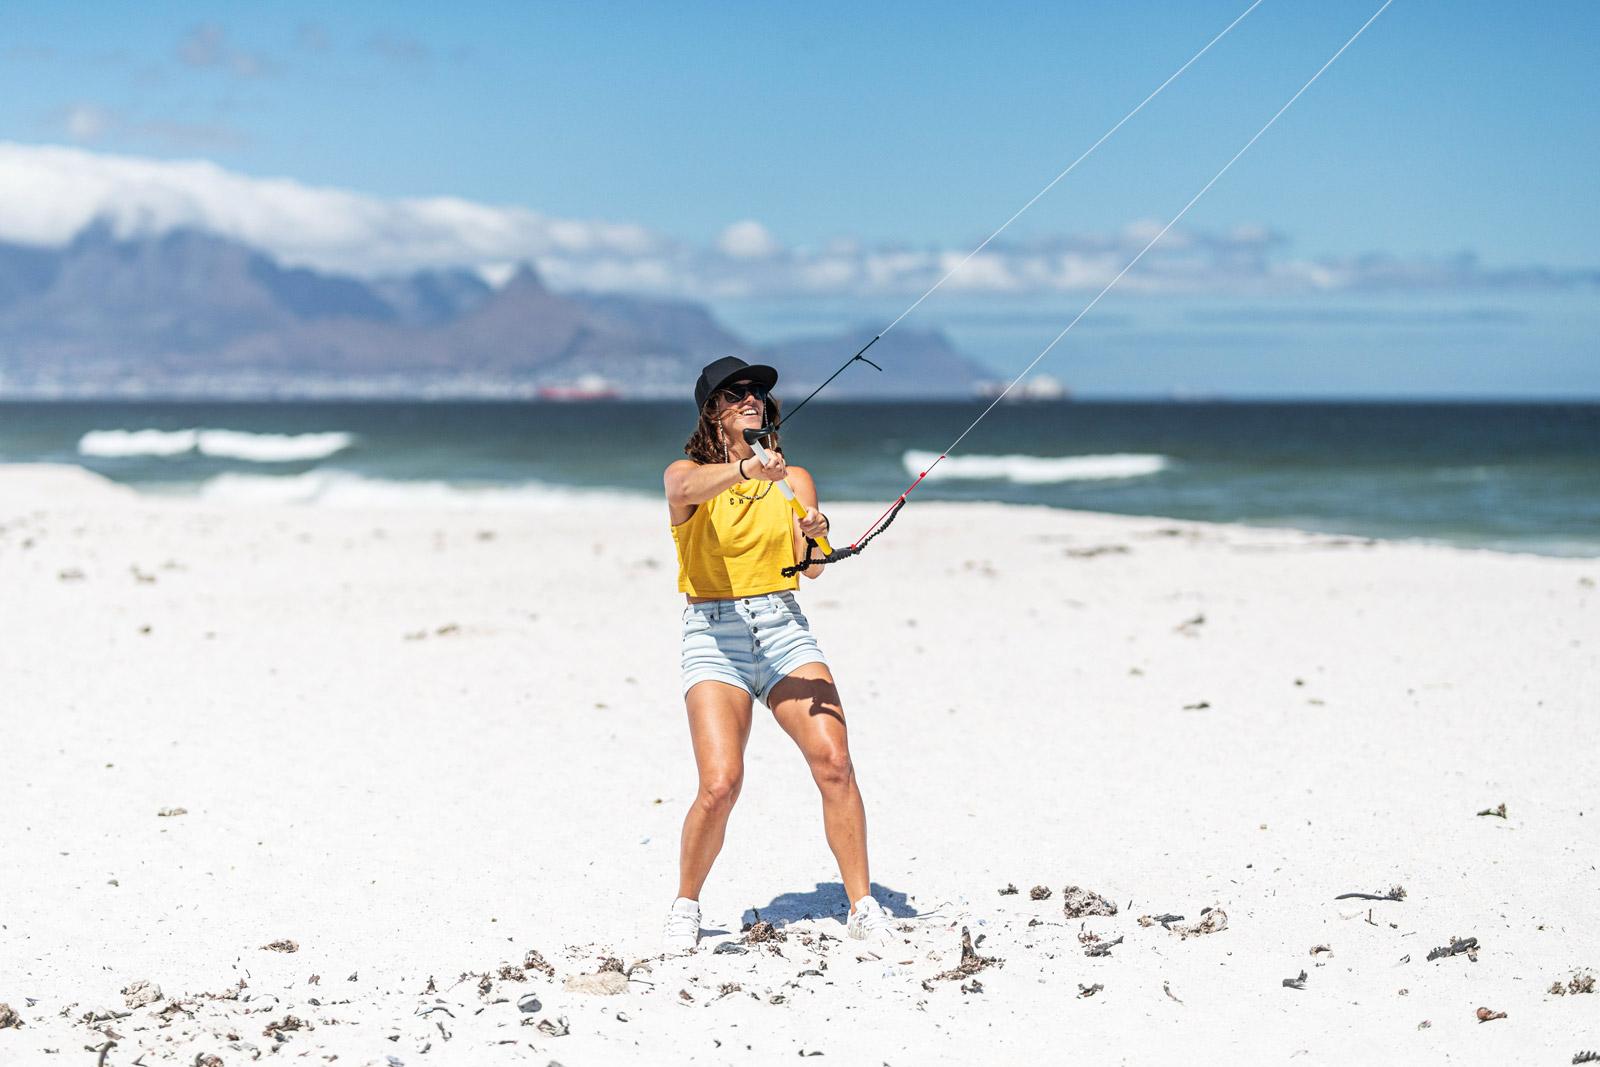 CORE-Kiteboarding-Xperience_Trainer-Kite_2m_1600_3